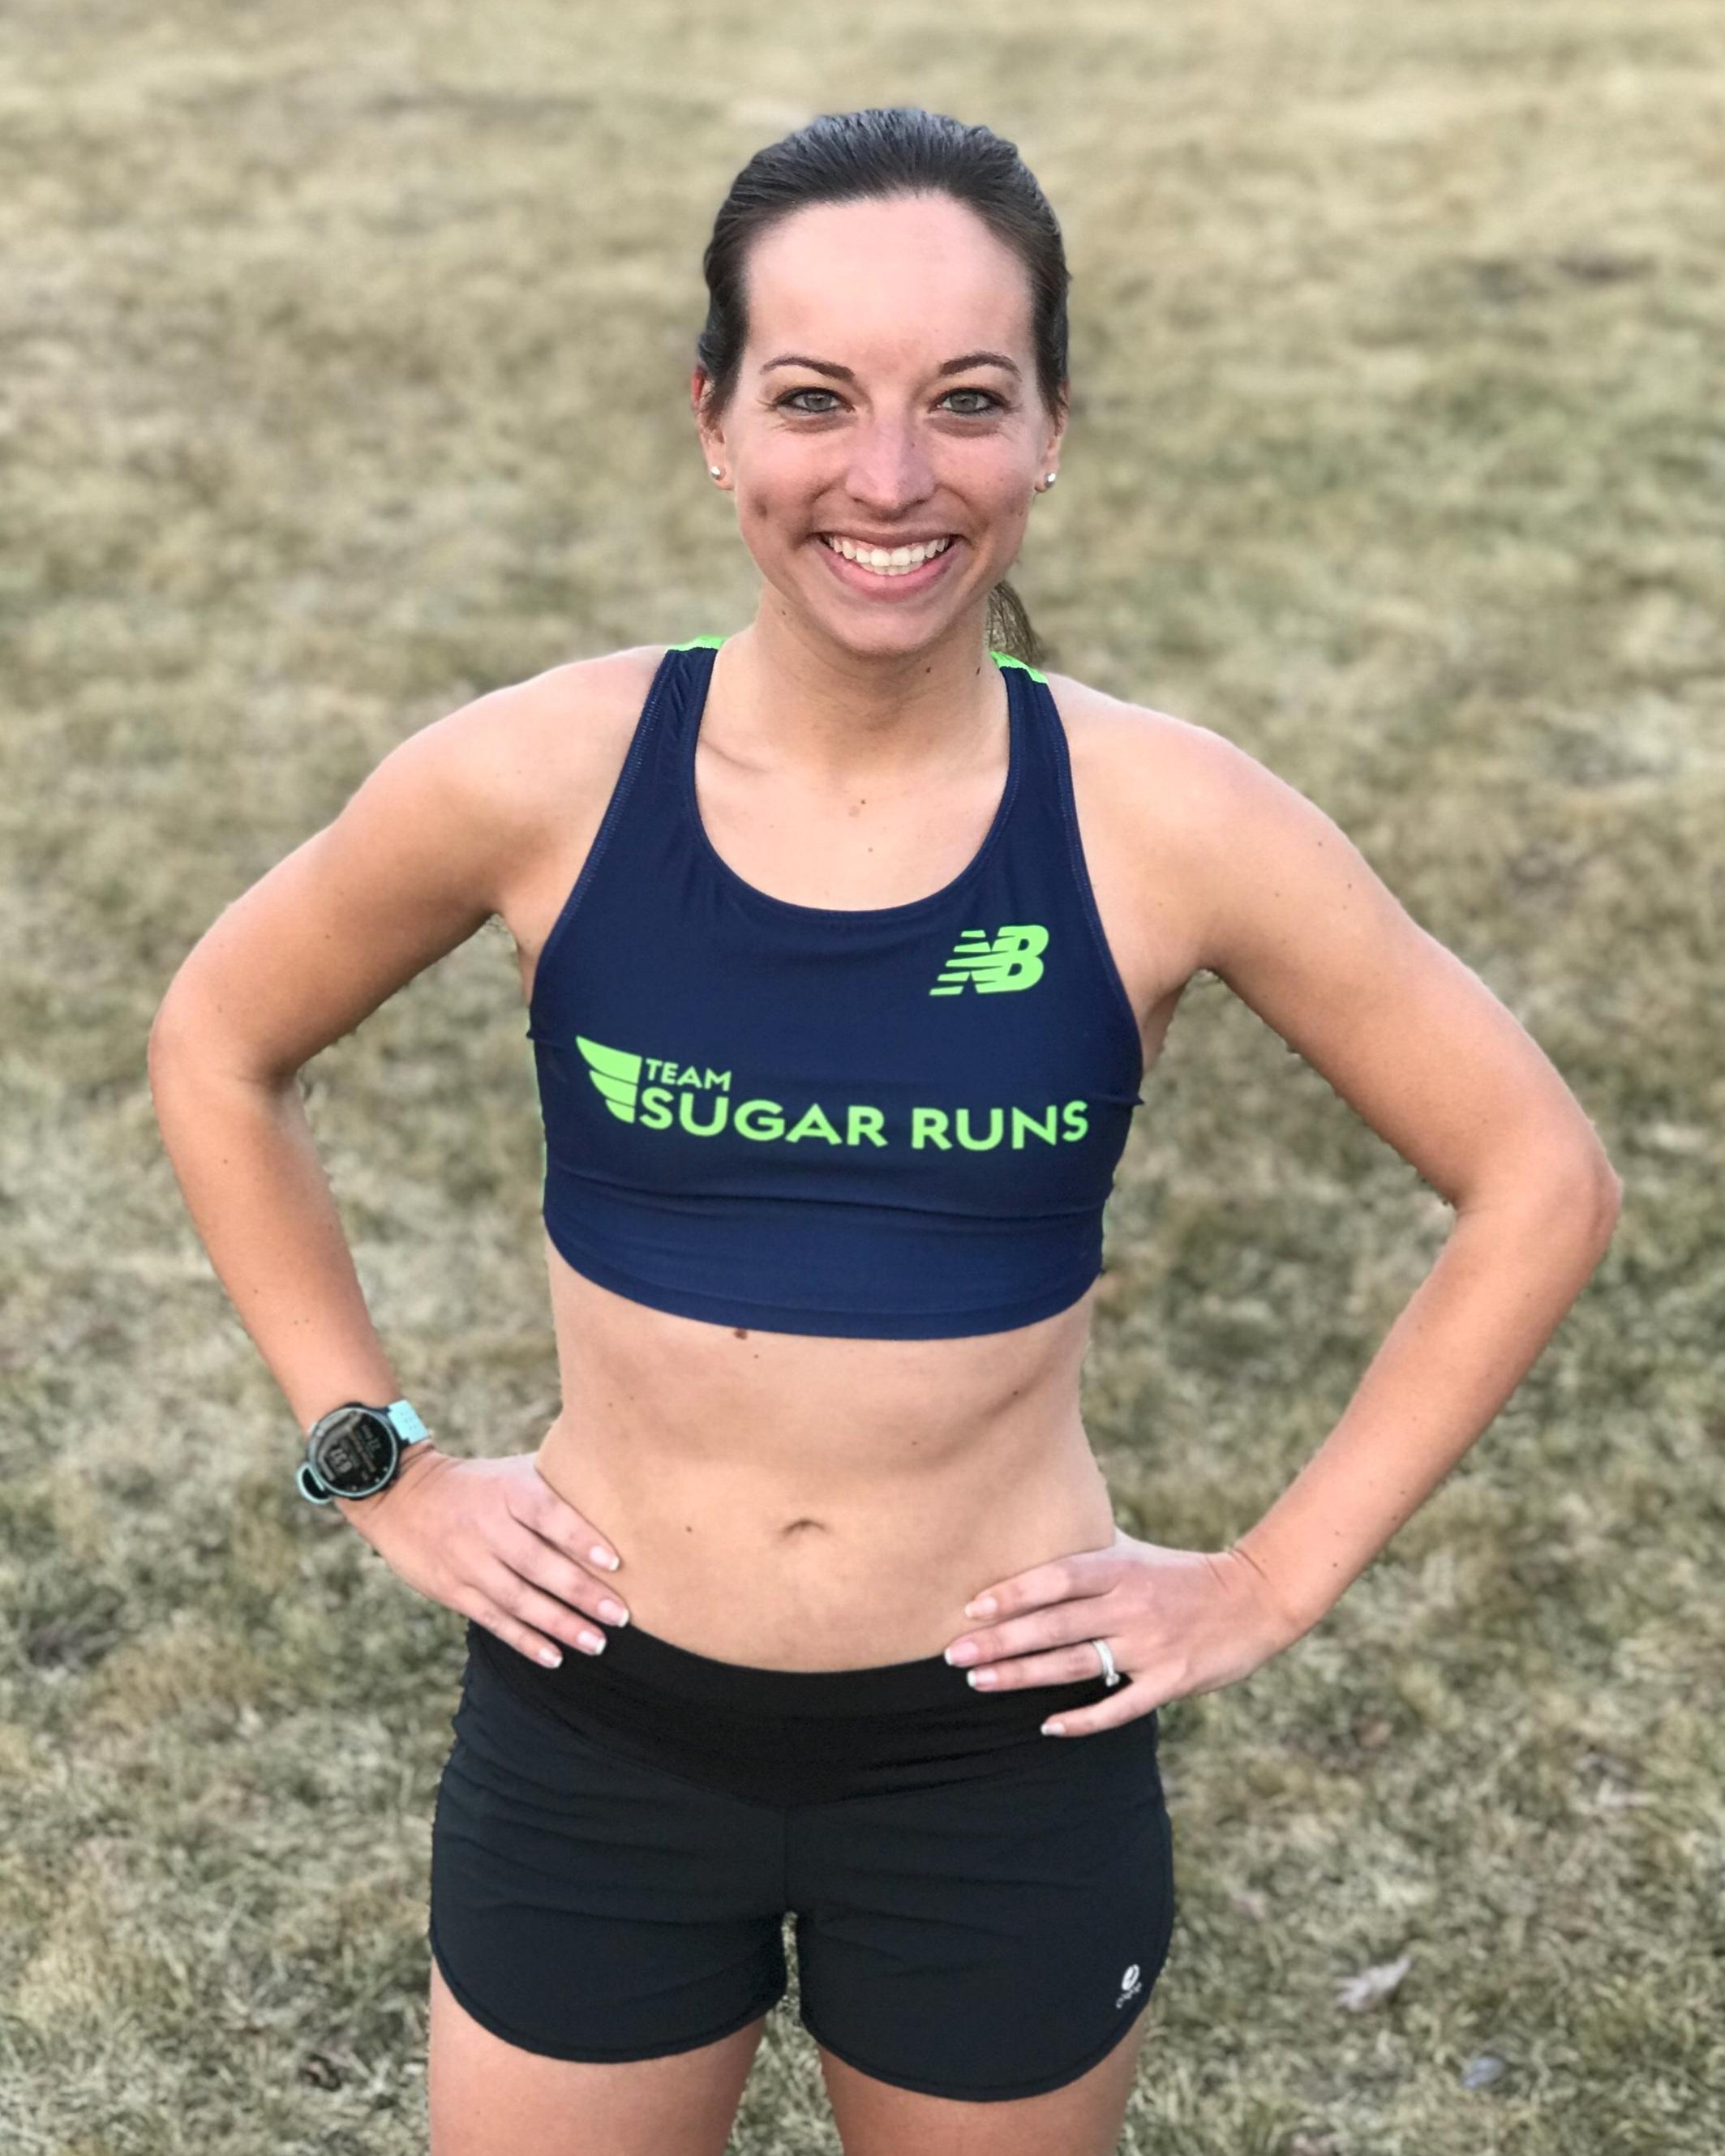 RRCA Certified Running Coach, Katherine Wuestenfeld